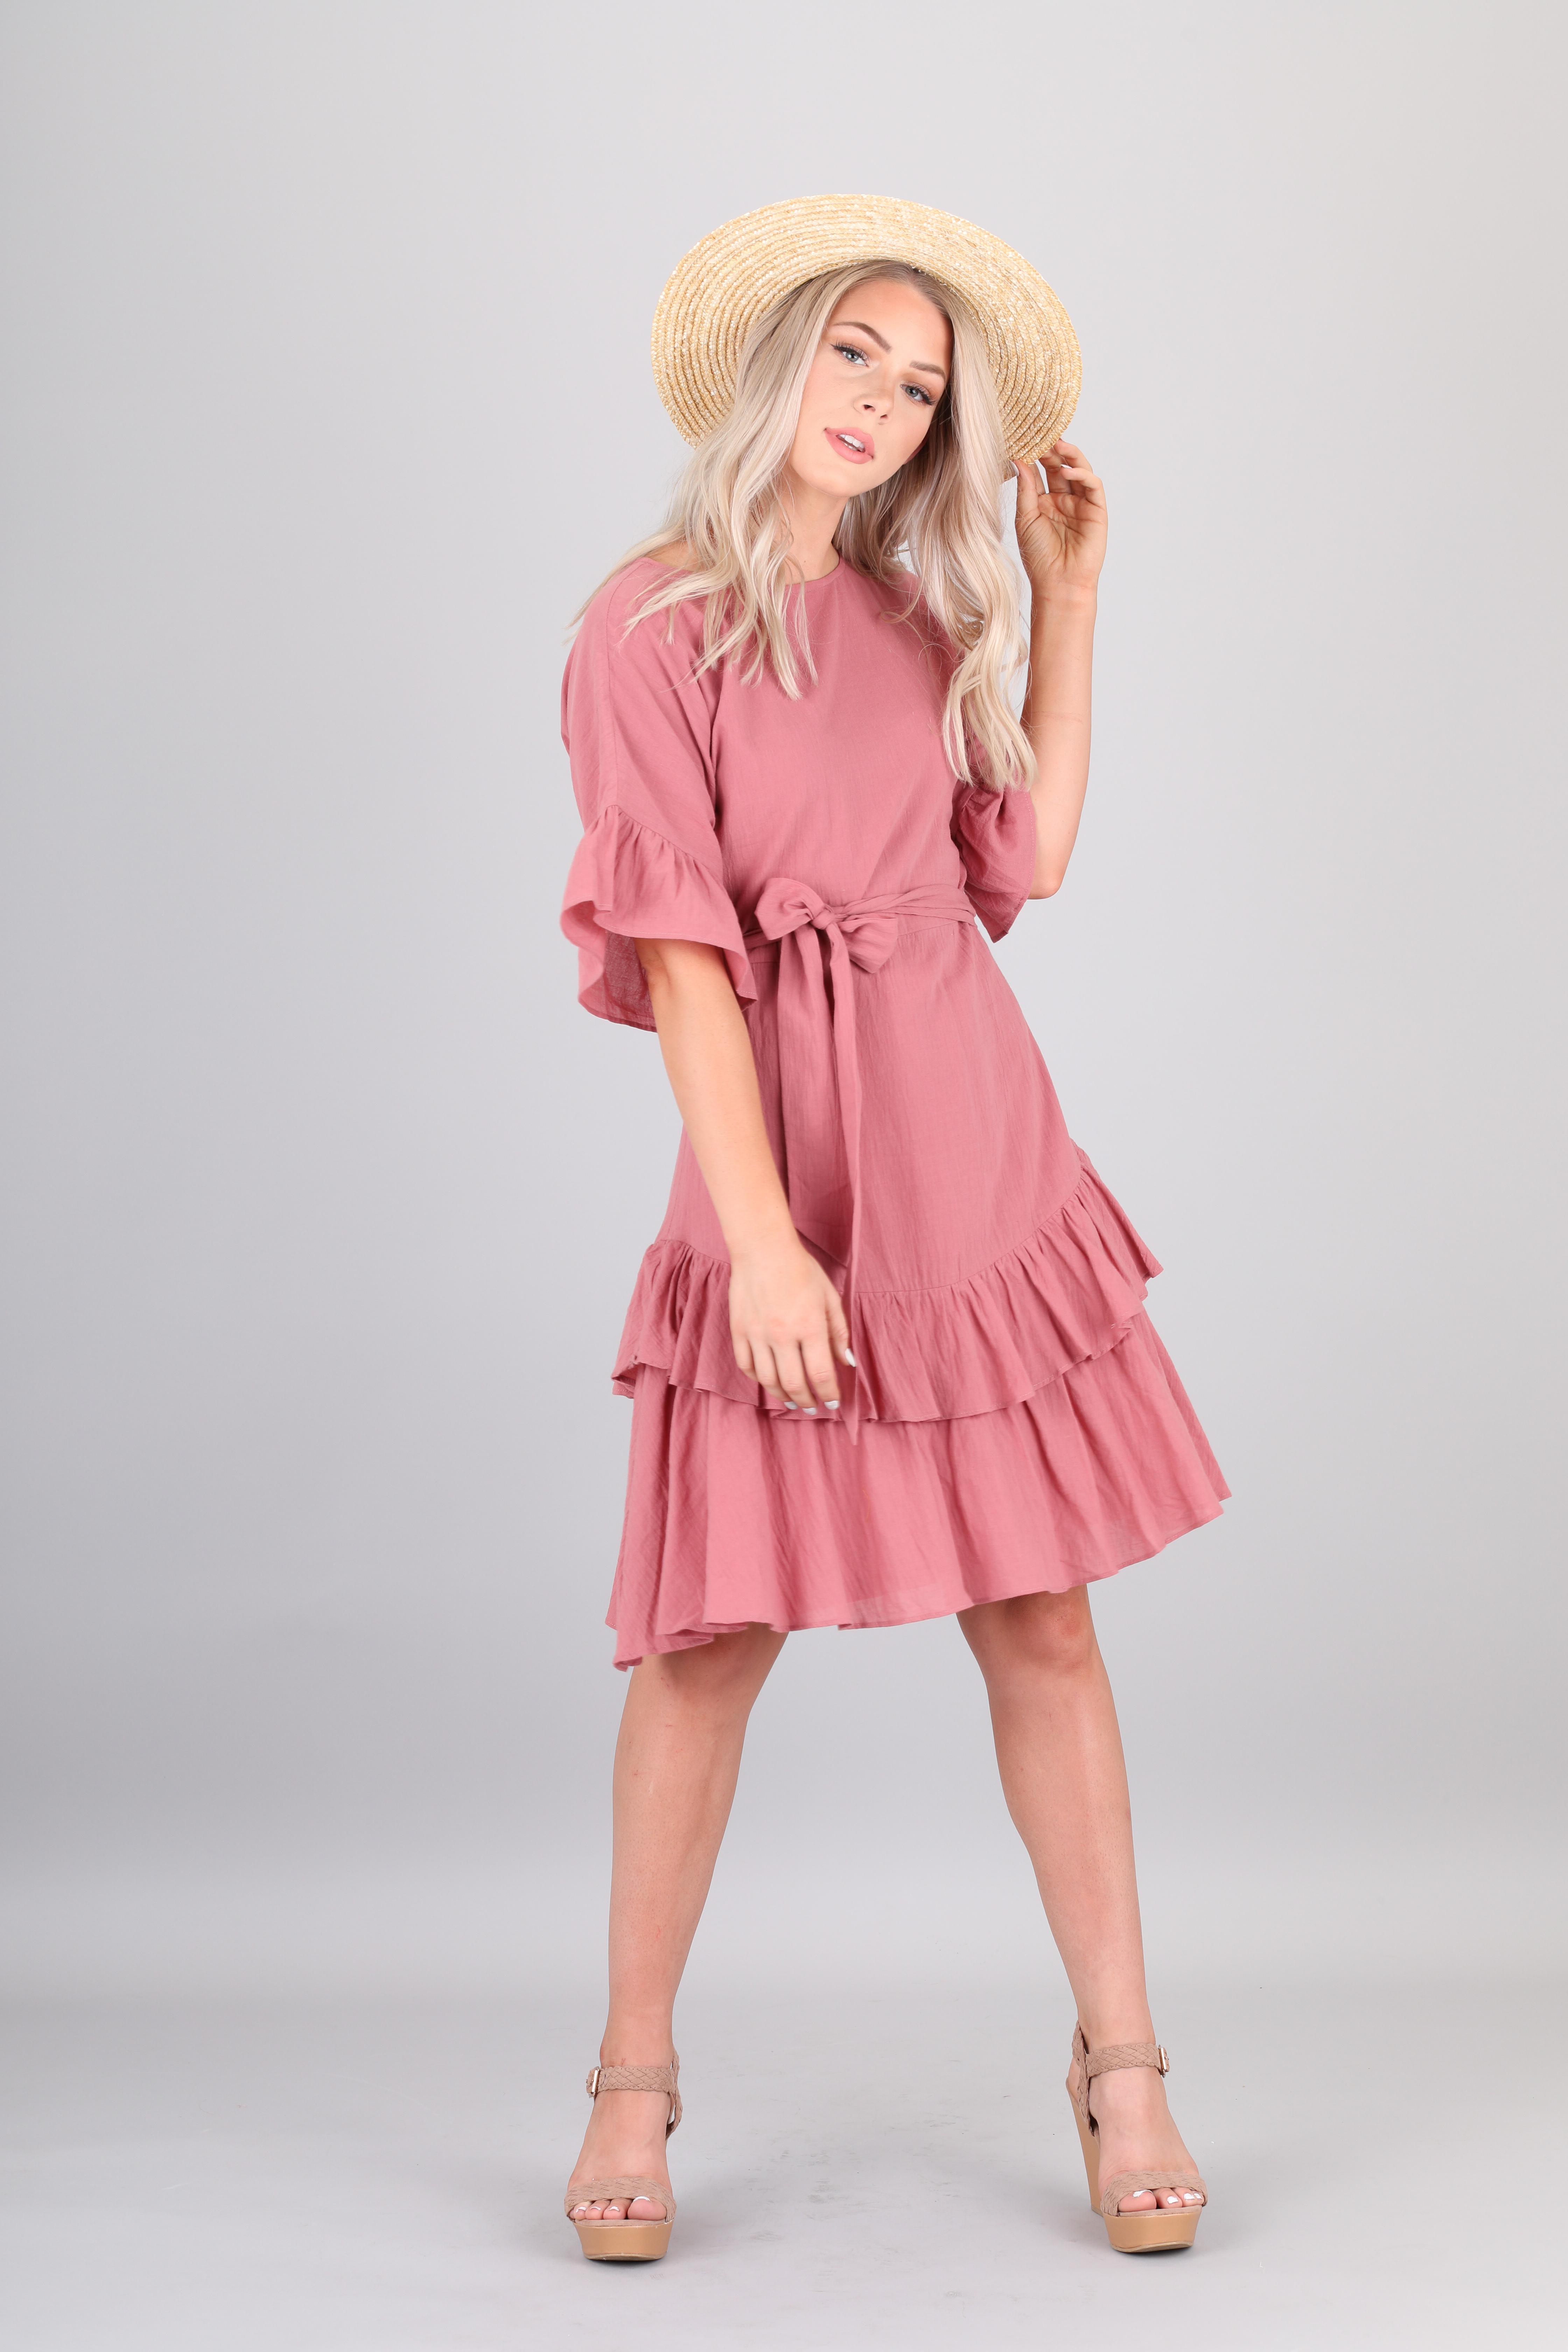 Mikarose Brynn Dress-Briar Rose